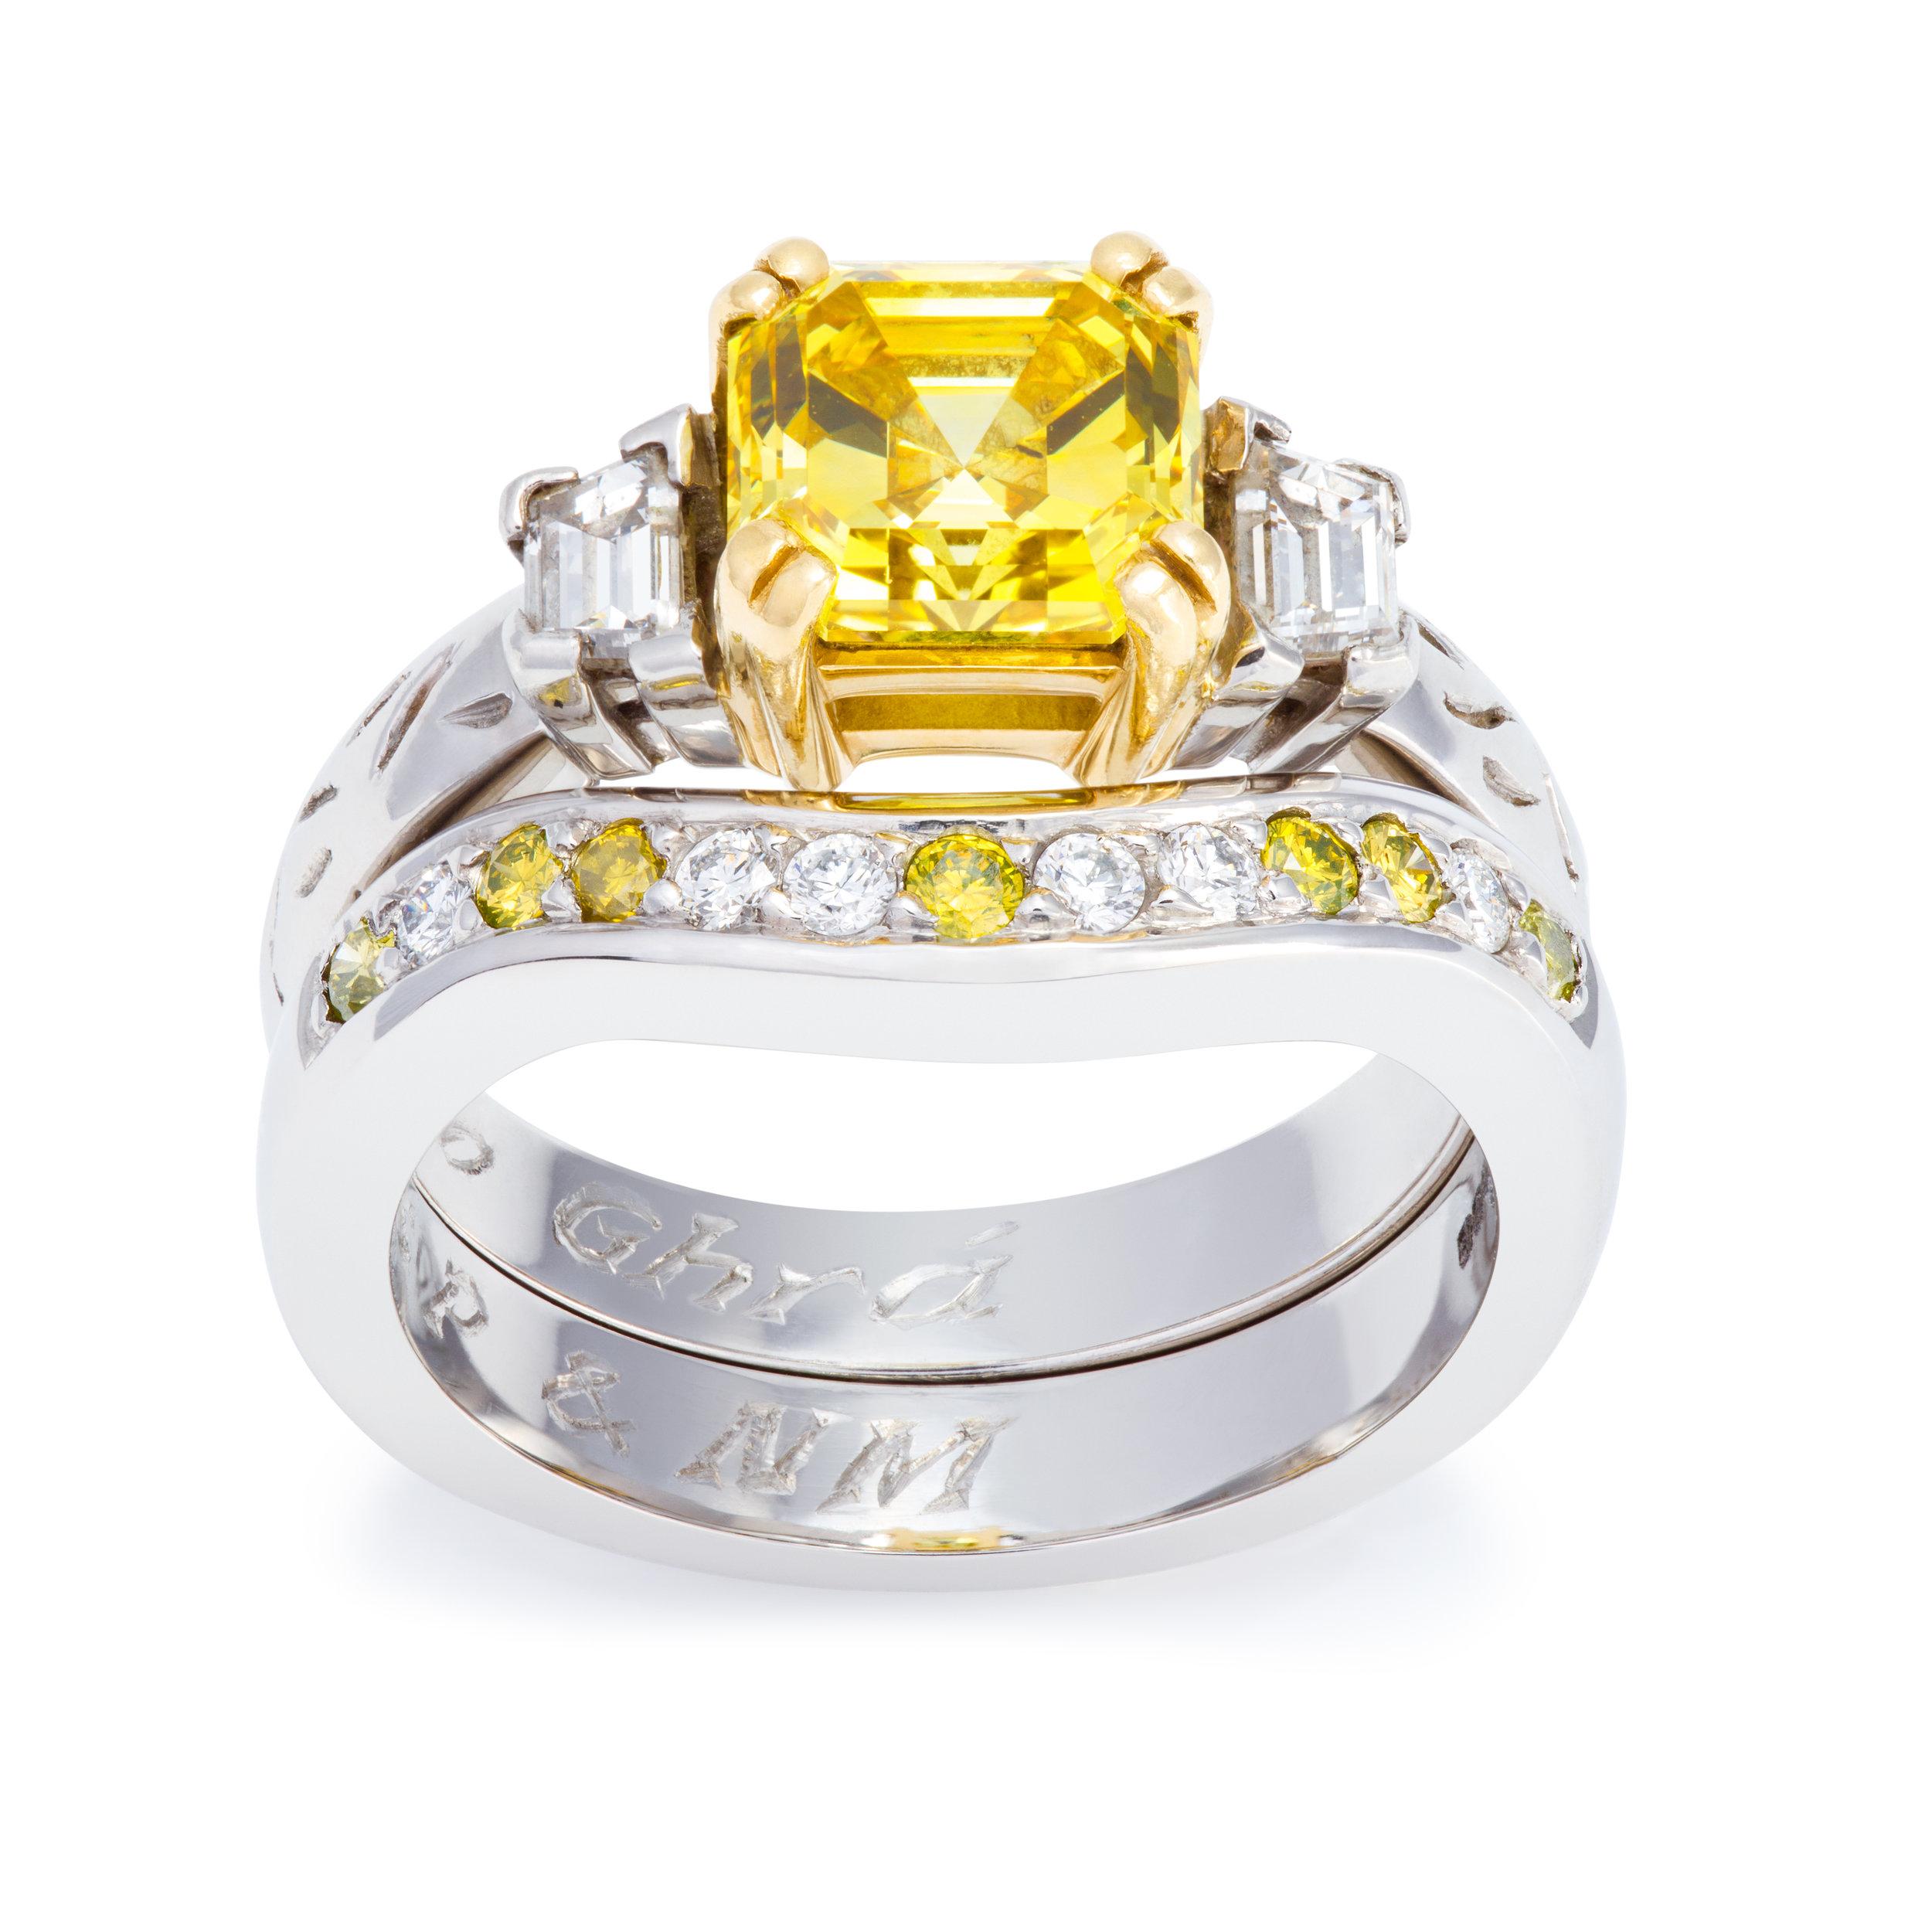 Bespoke platinum engagement ring and wedding ring commission both set with yellow diamonds and white diamonds.